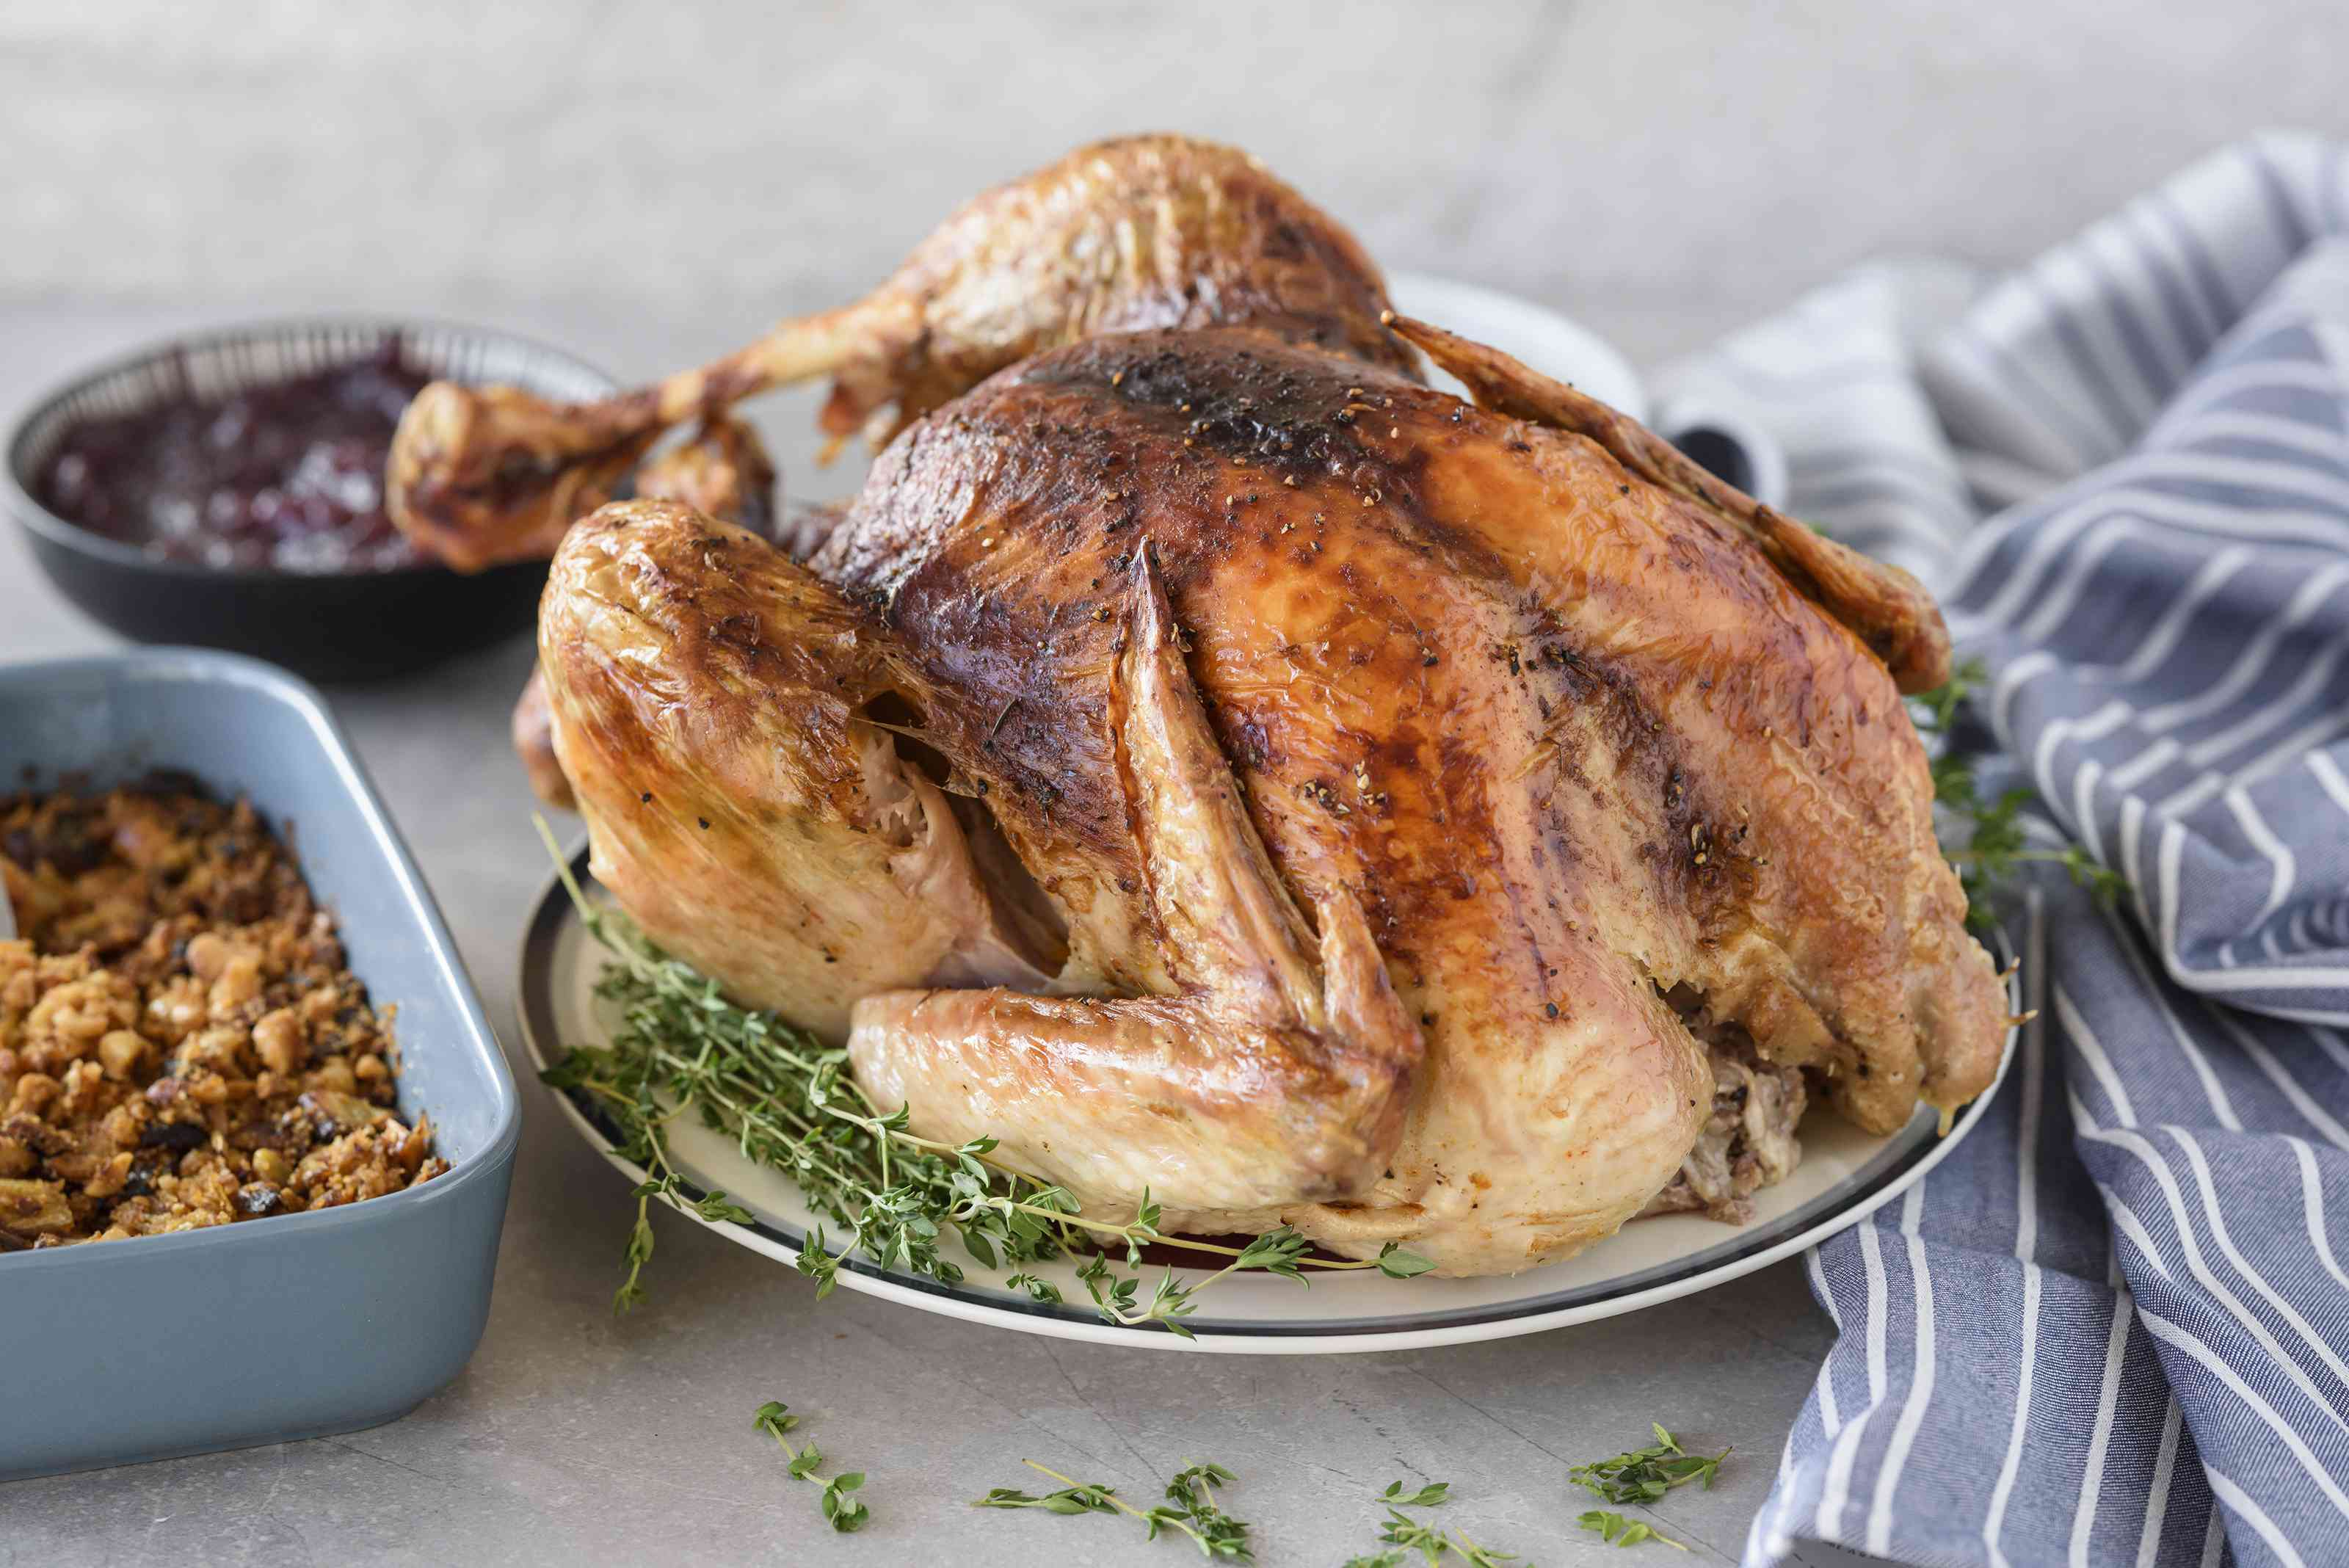 Cajun deep fried turkey marinade recipe